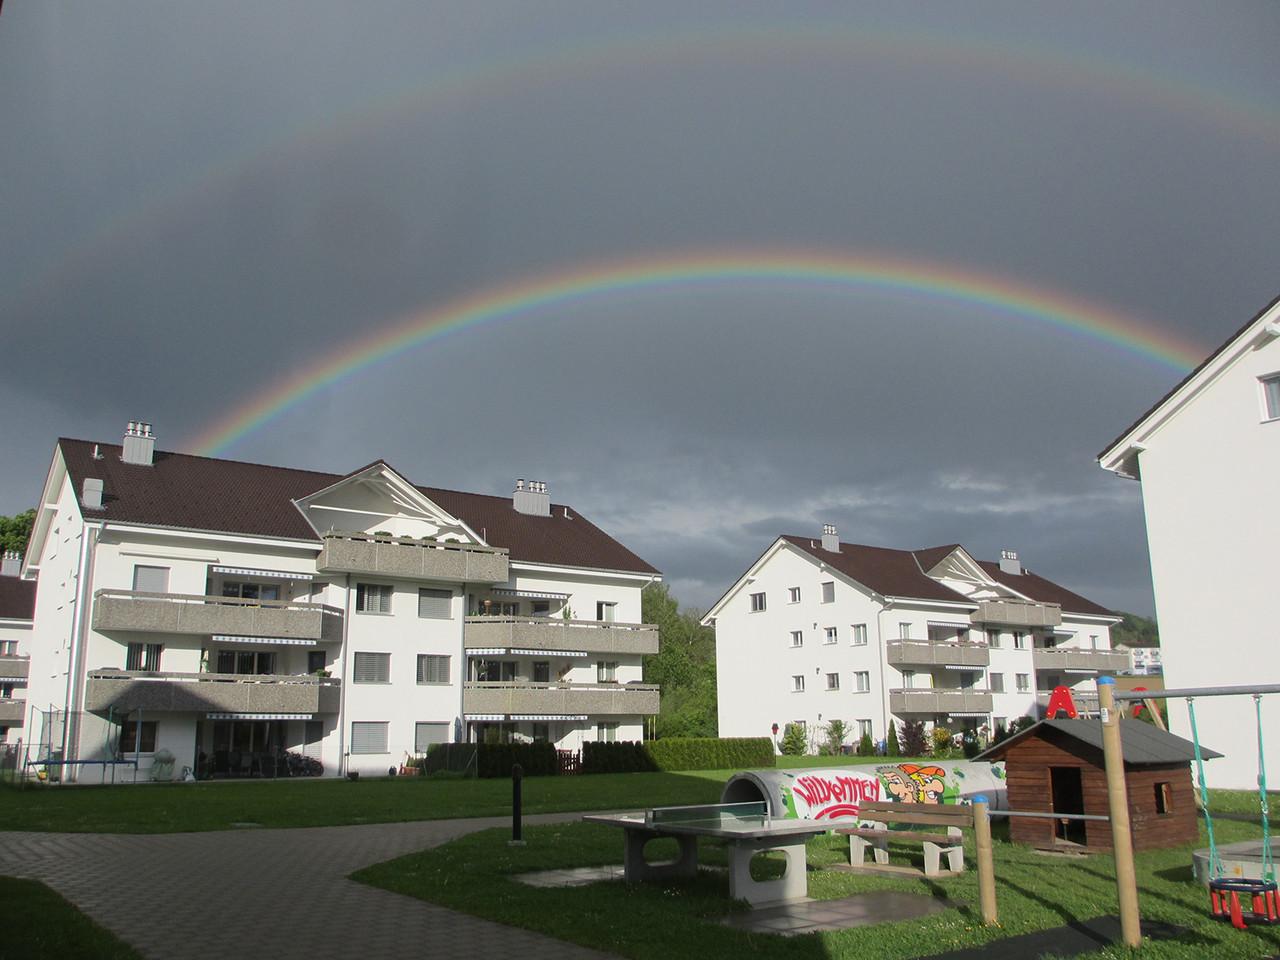 Doppelter Regenbogen über dem Tunaupark!